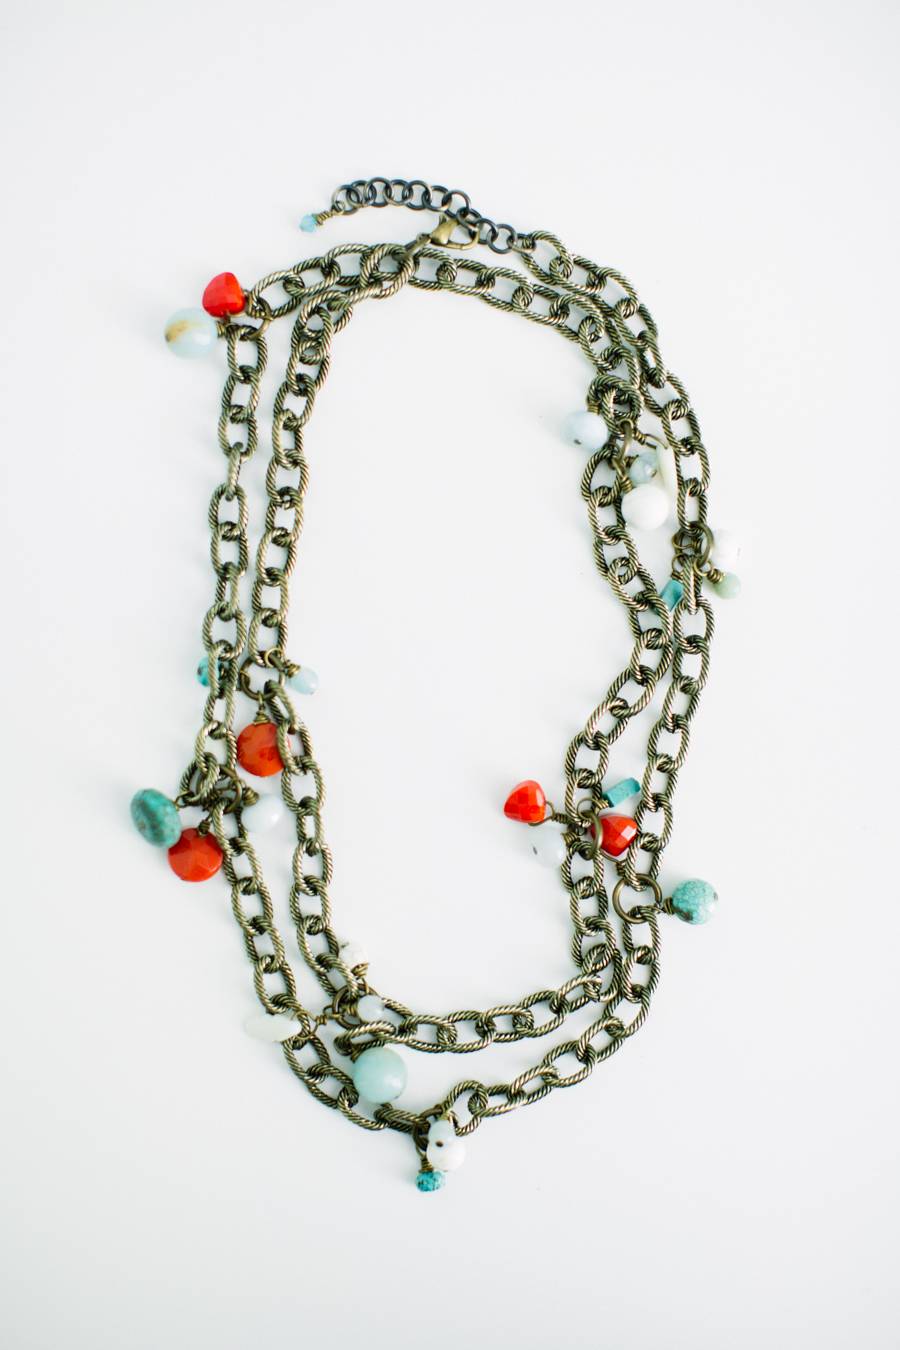 Jewelry-MackenzieKern-20.jpg